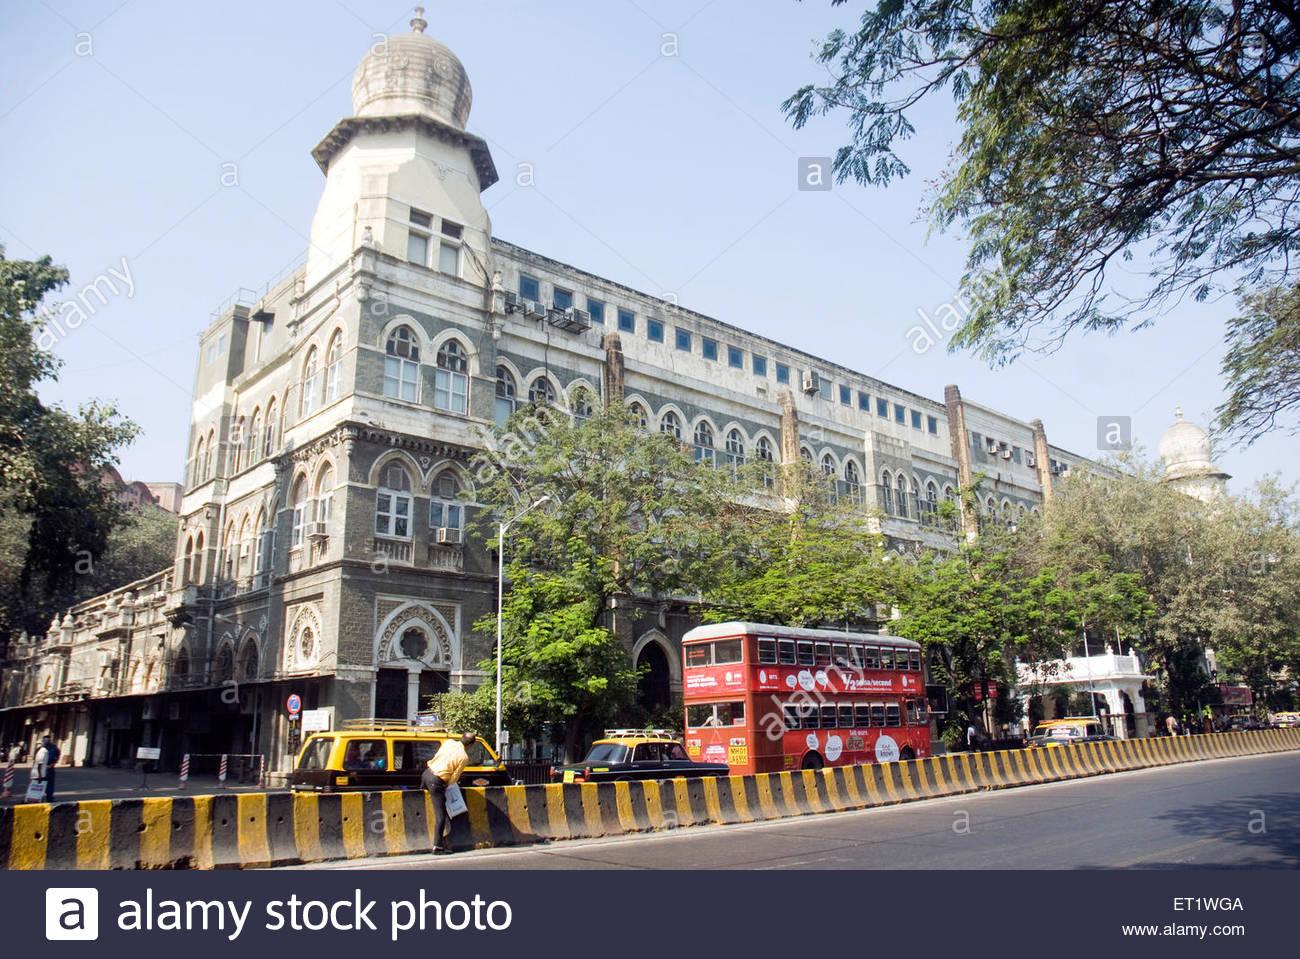 india times mumbai edition